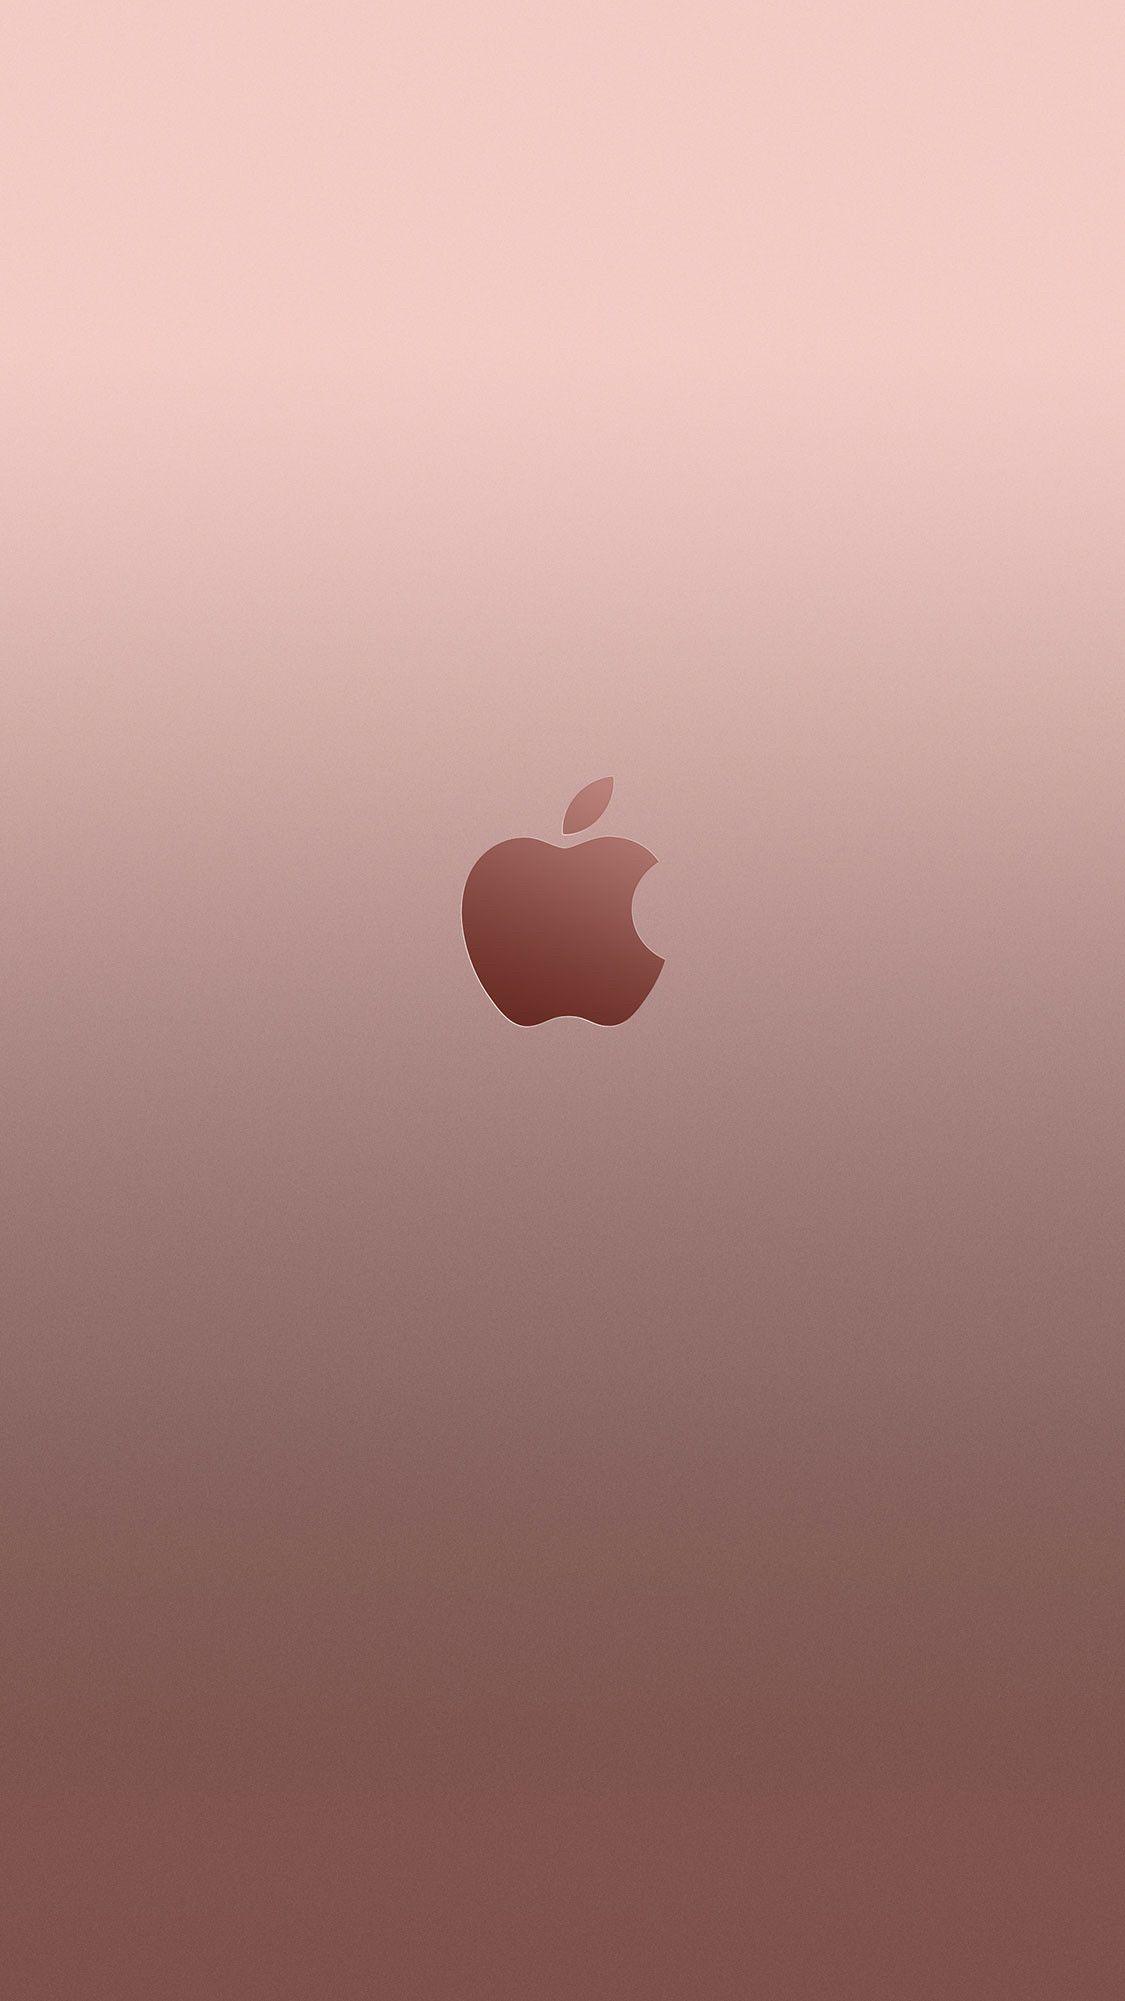 1125x2001 Rosegold iPhone 6 wallpaper · Hintergrundbilder ... #fondecran